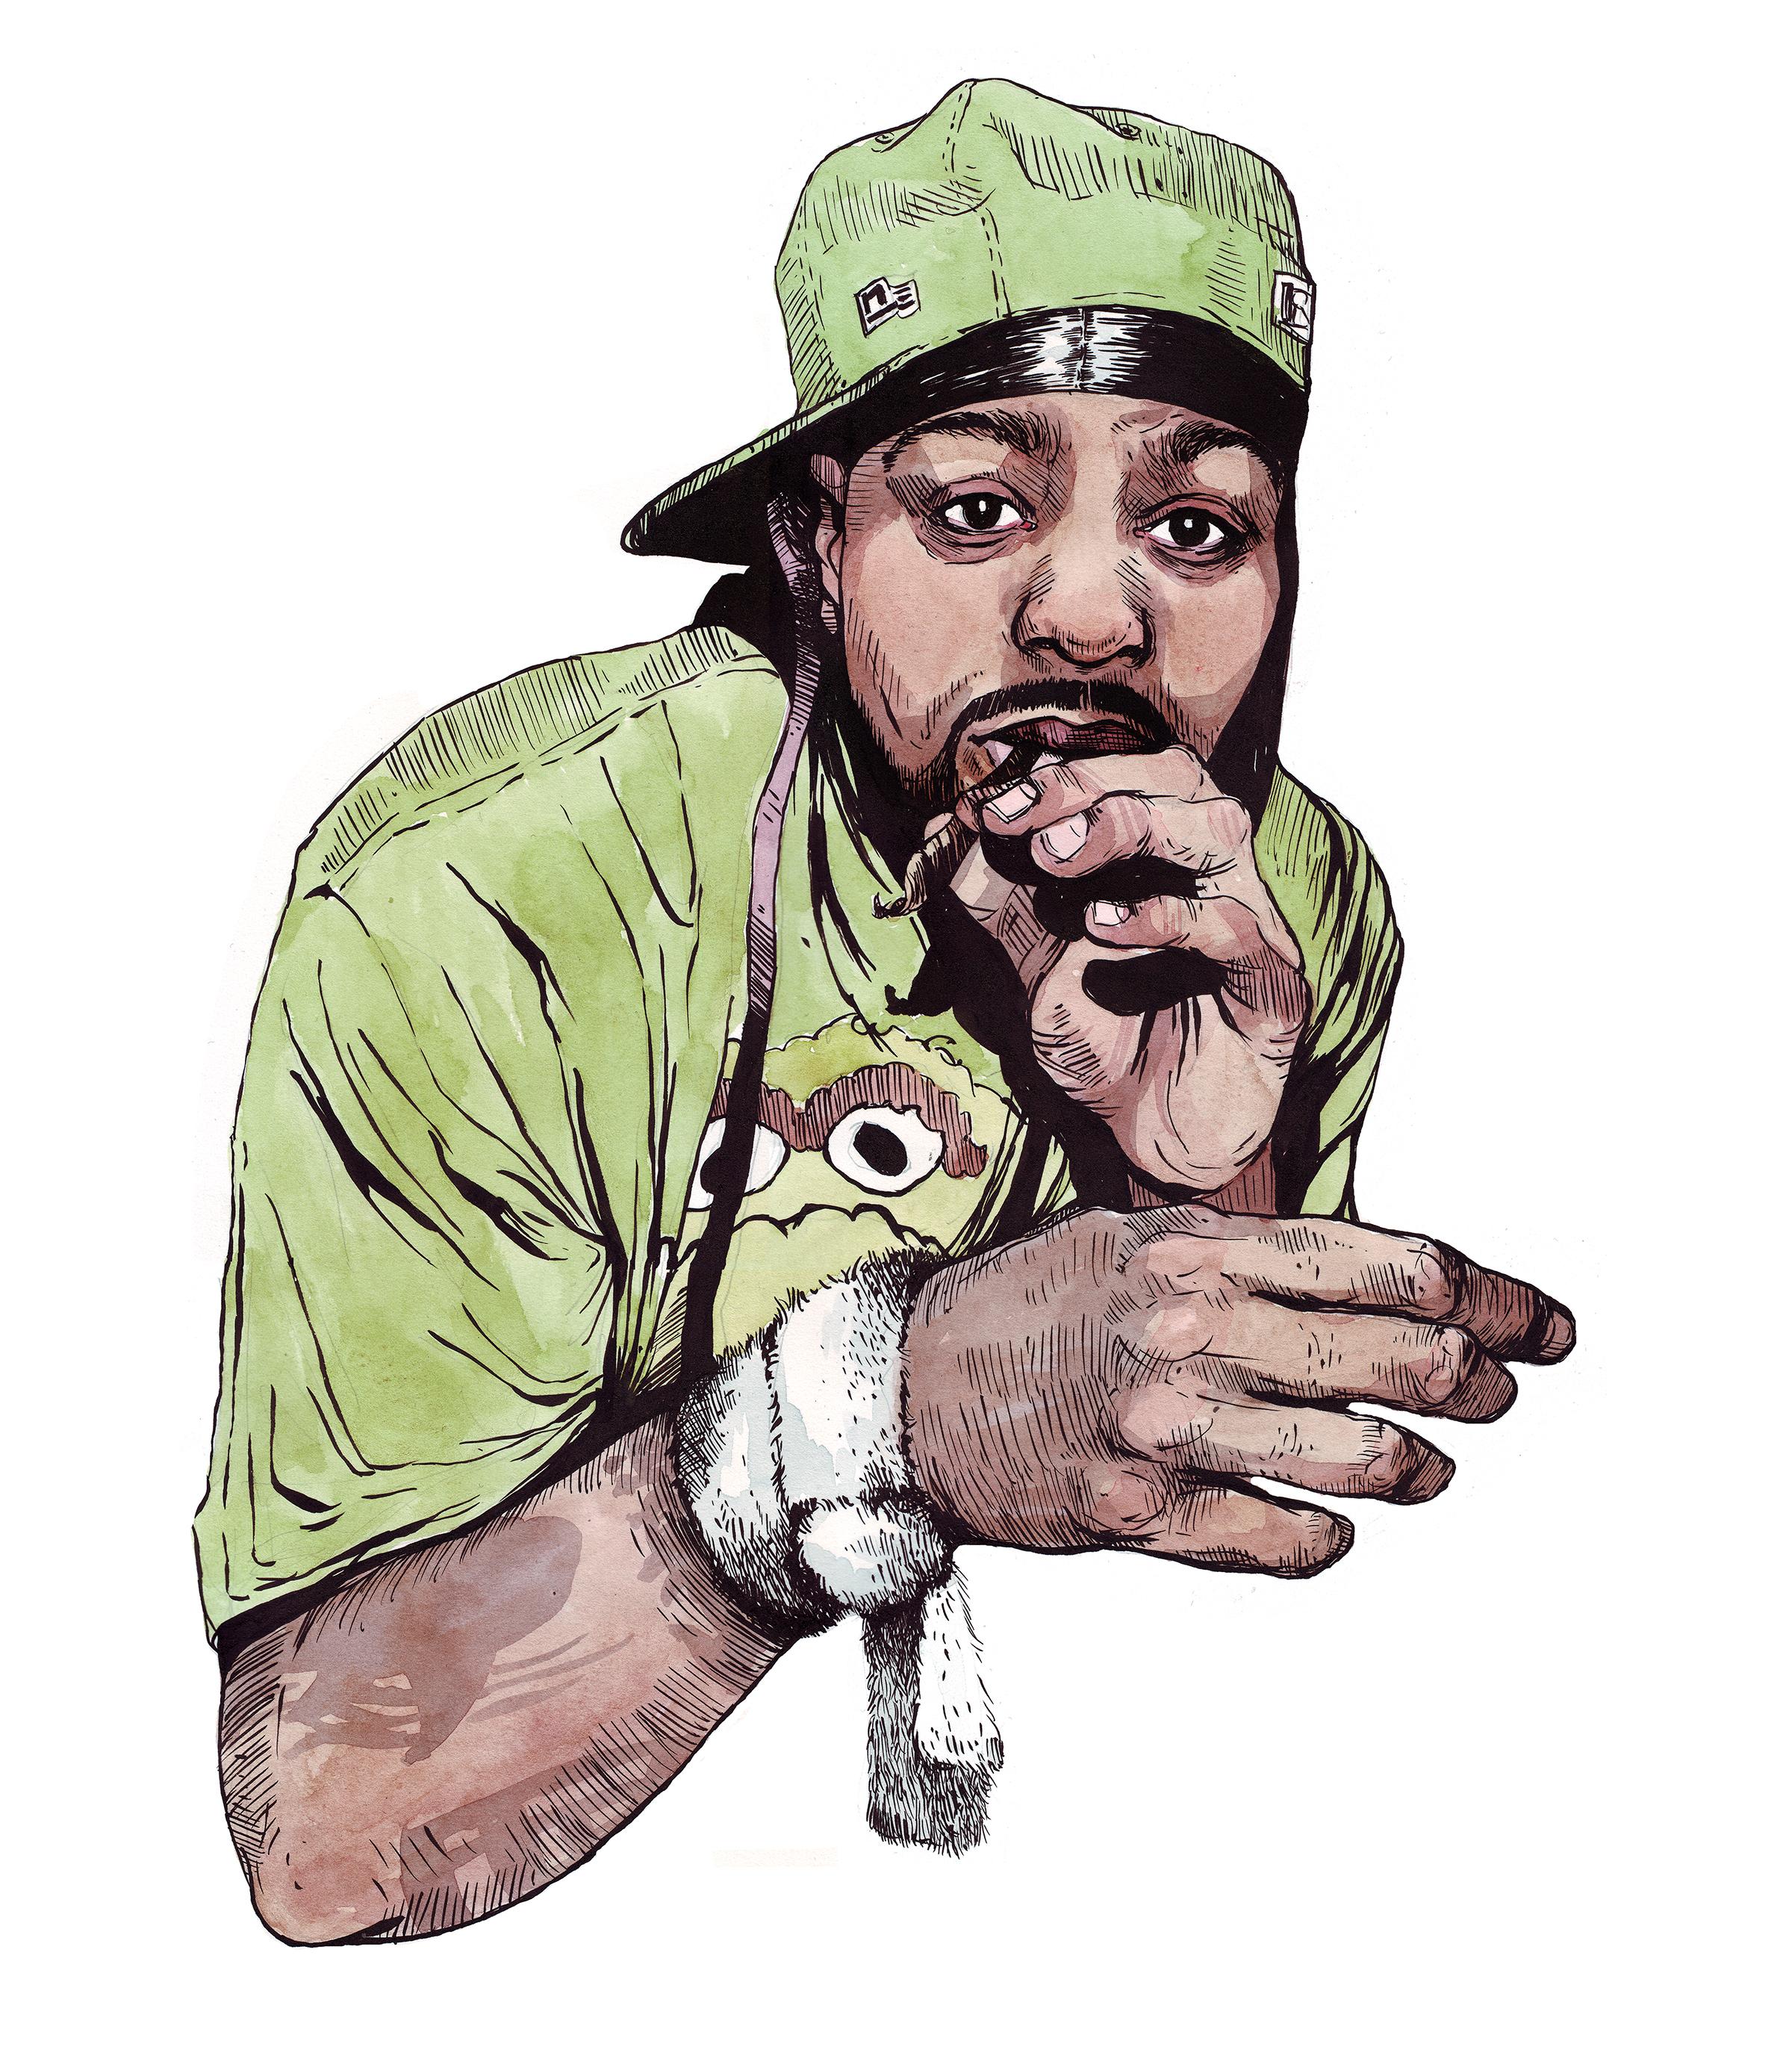 Method Man for Warner Bros Entertainment, Ink & Watercolor 2016